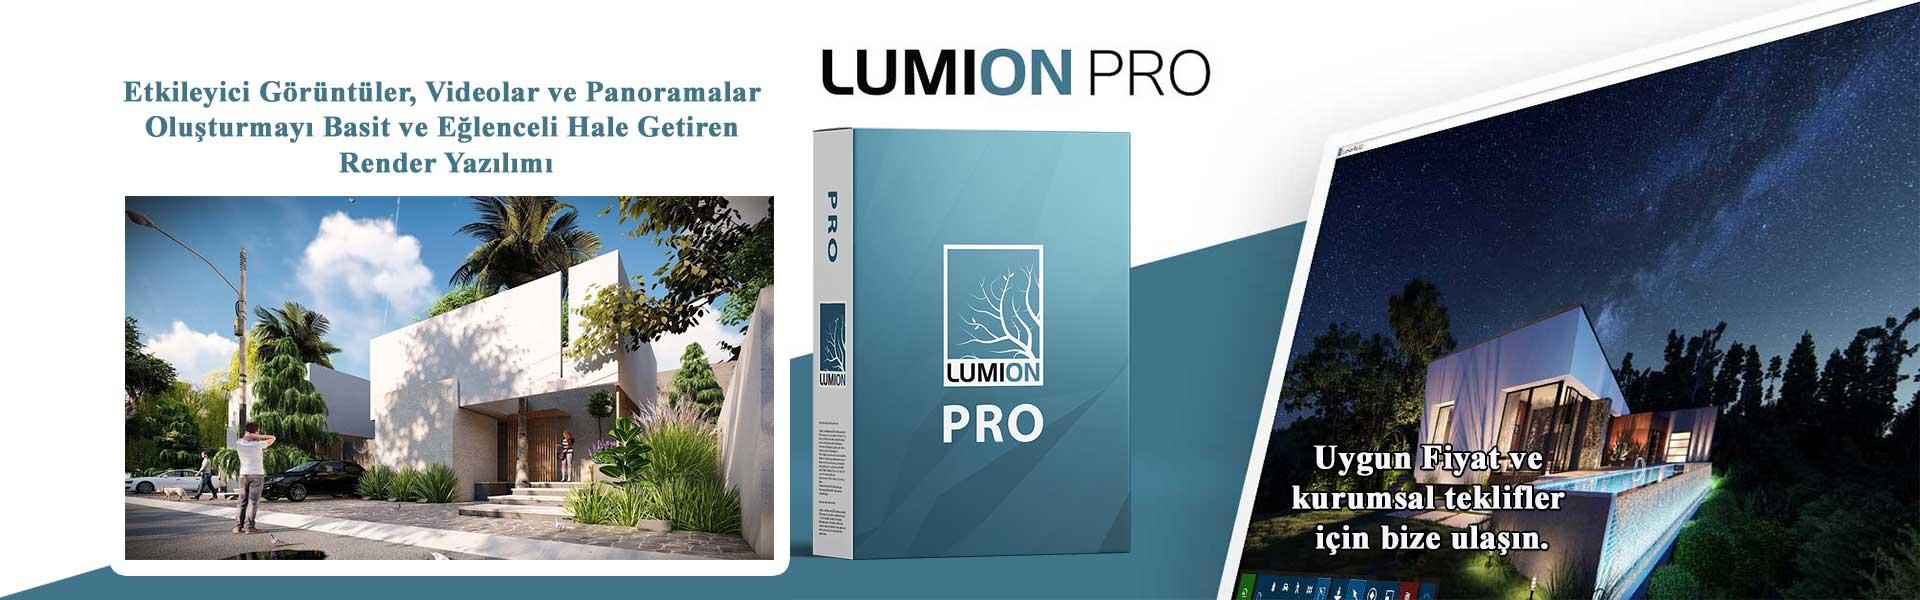 Lumion-pro-slider